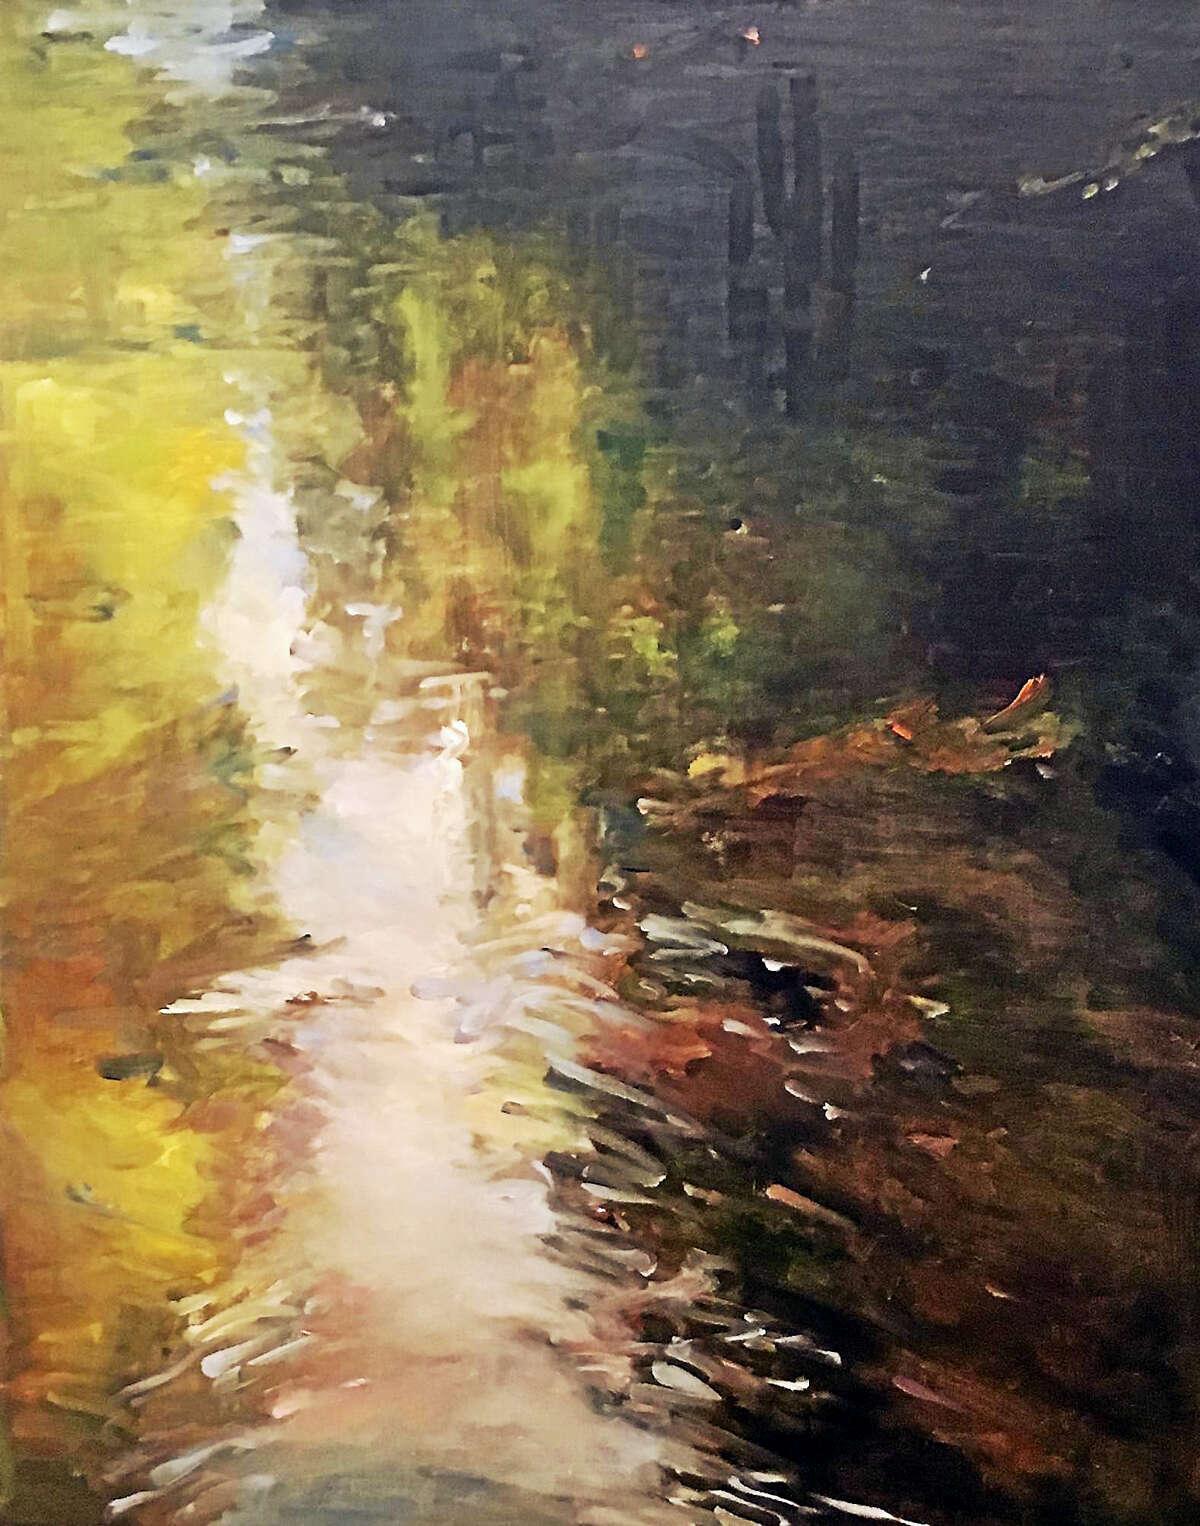 River Flow, Maryellen Furse, oil on canvas, 24 x 30 in.